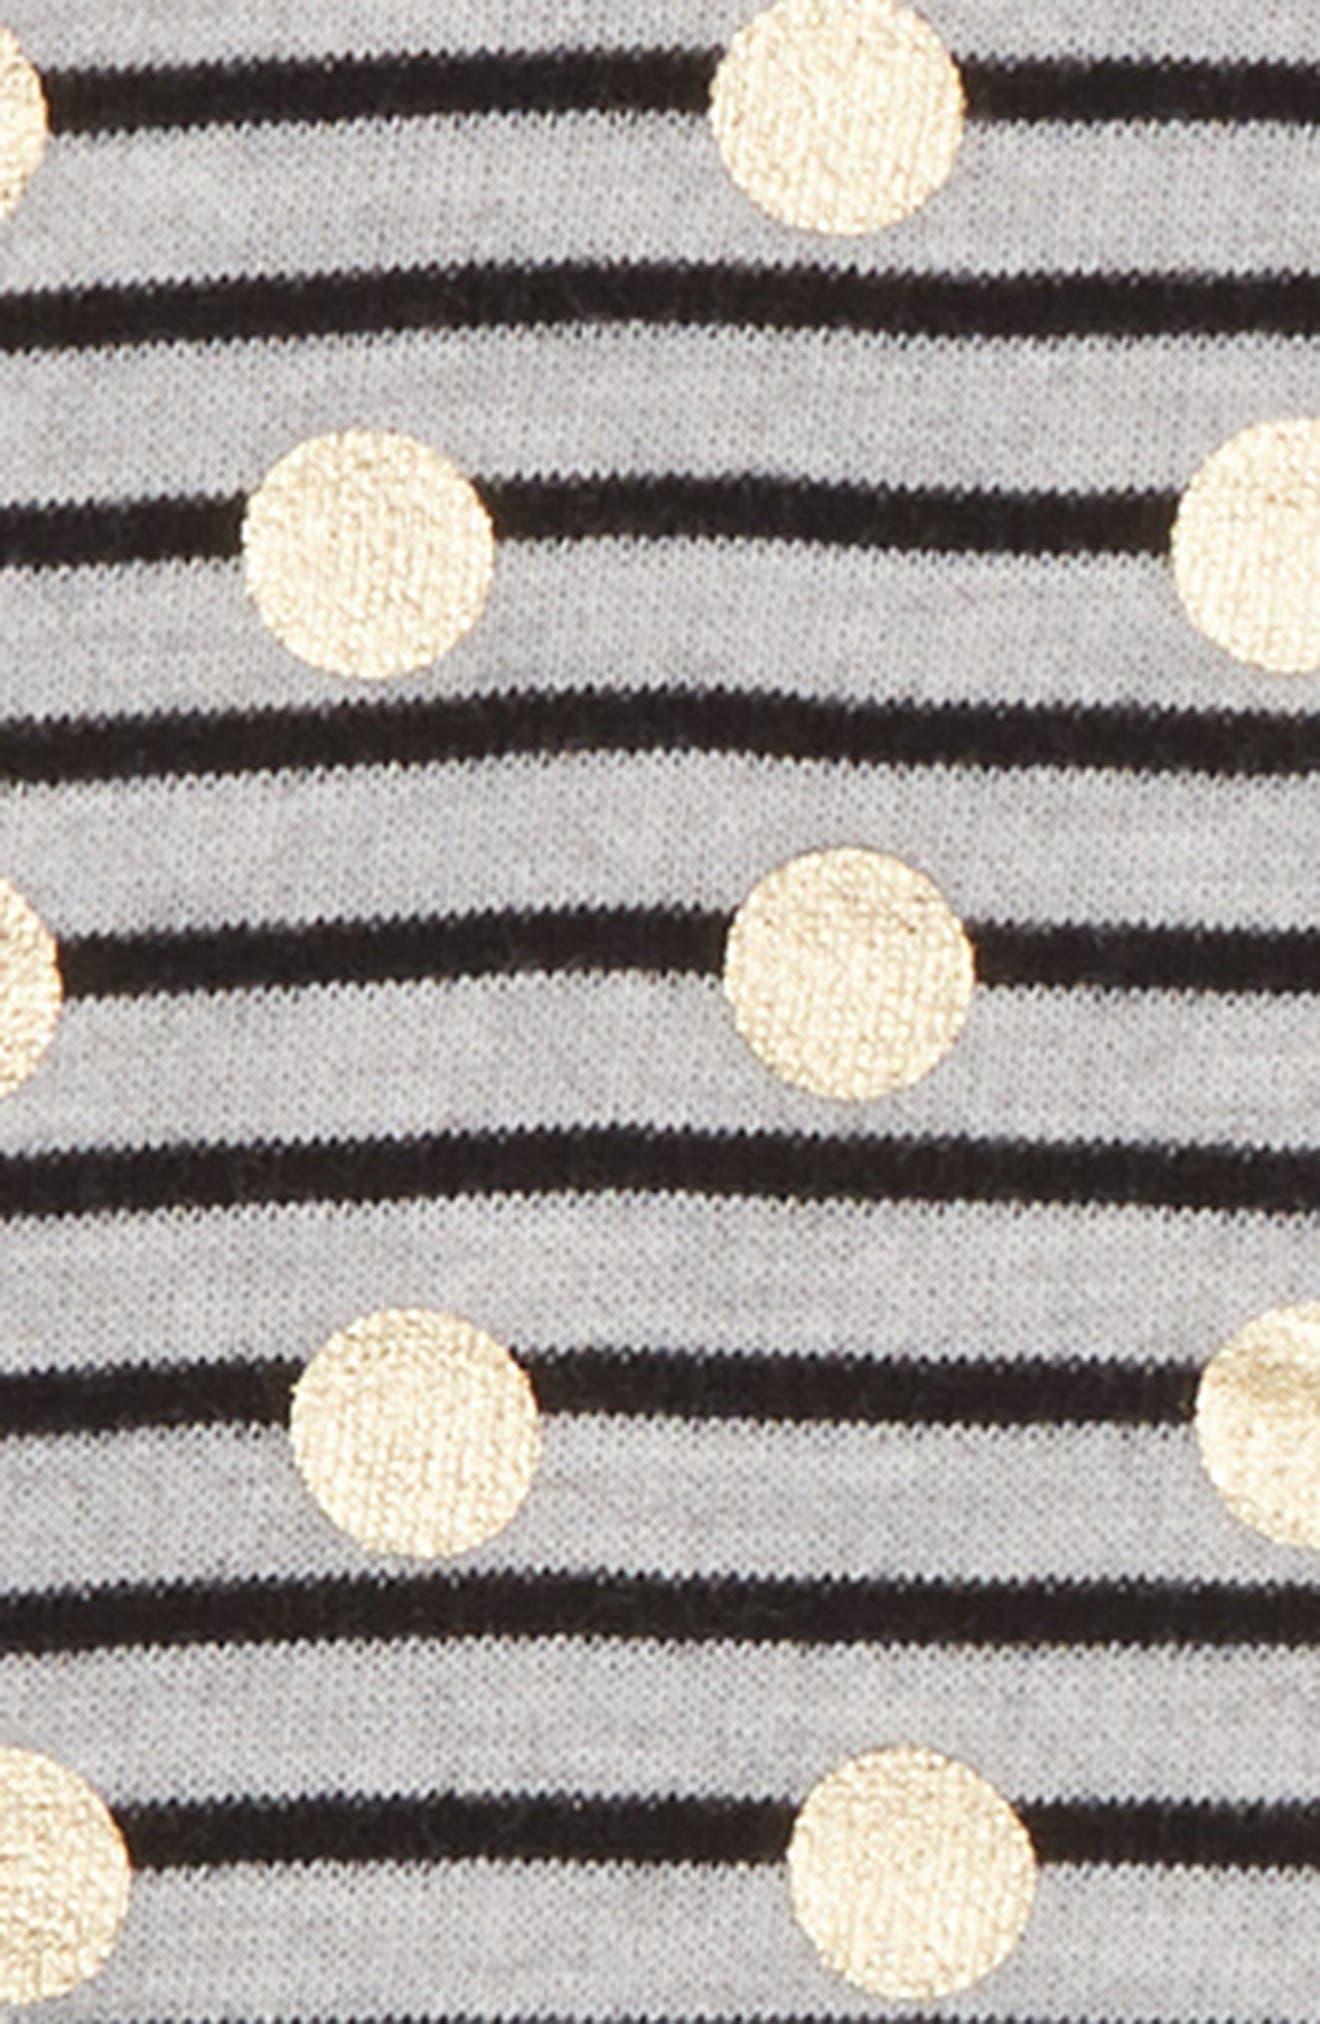 Stripe Print Tunic,                             Alternate thumbnail 2, color,                             GREY ASH HEATHER DOT